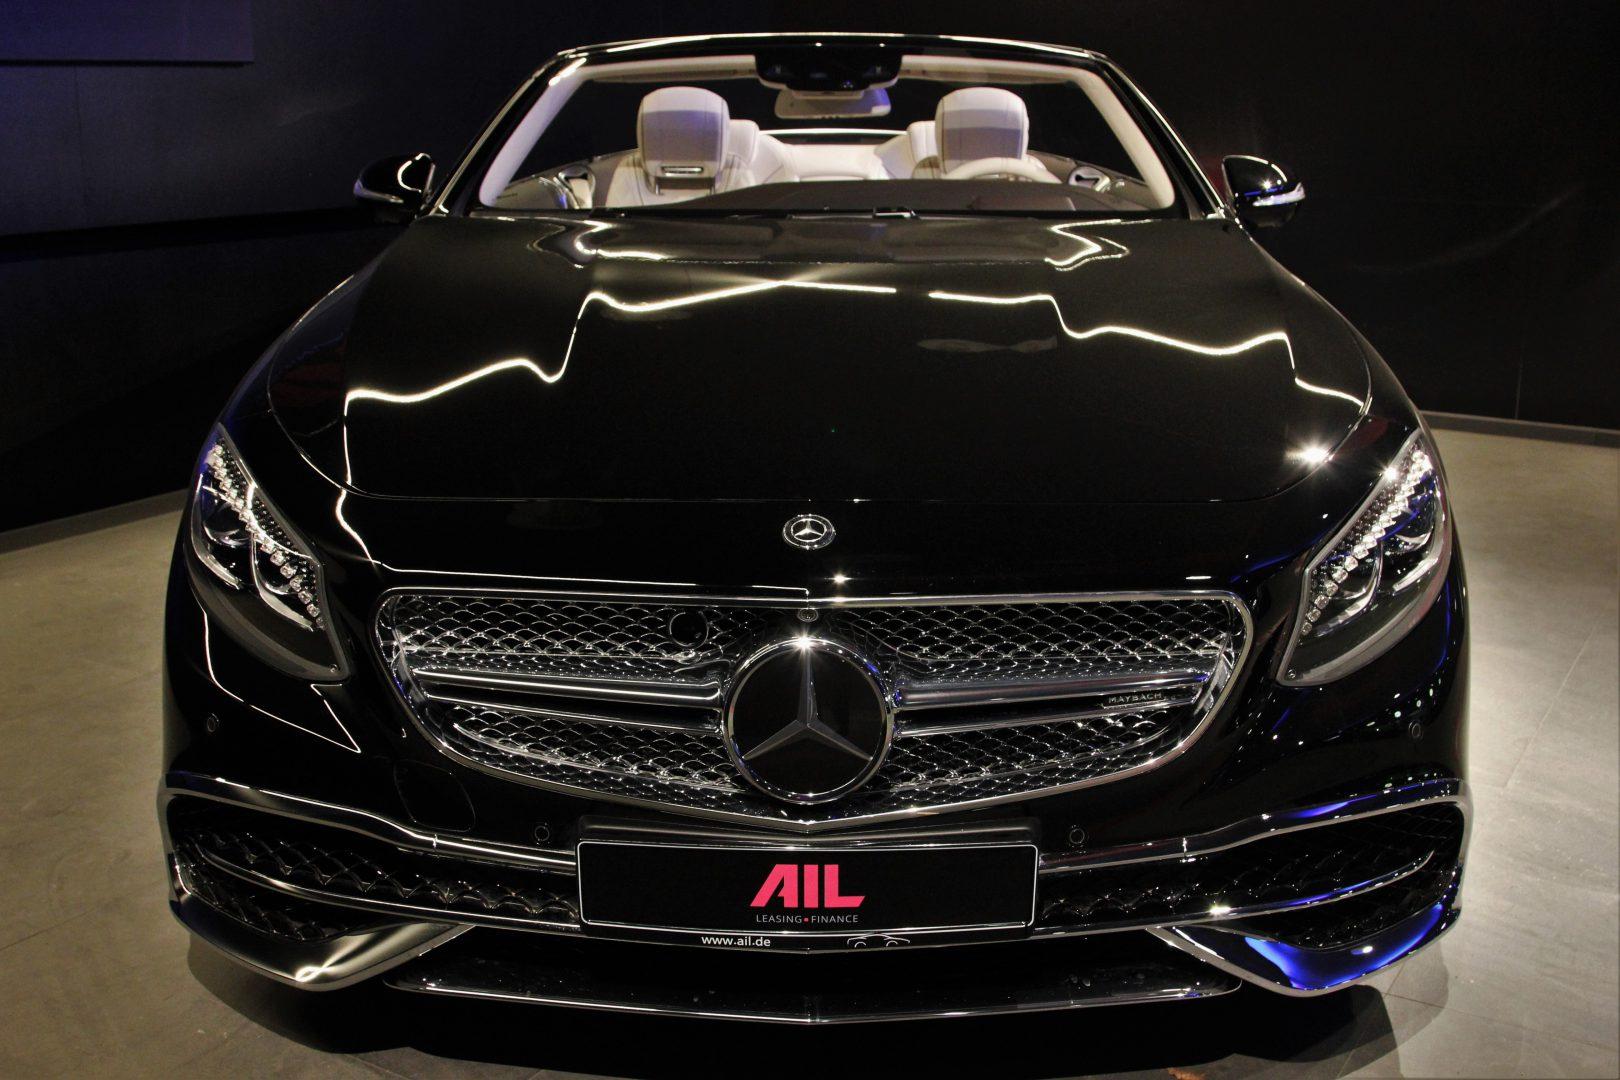 AIL Mercedes-Benz S650 MAYBACH V12 Exklusiv-Paket 2